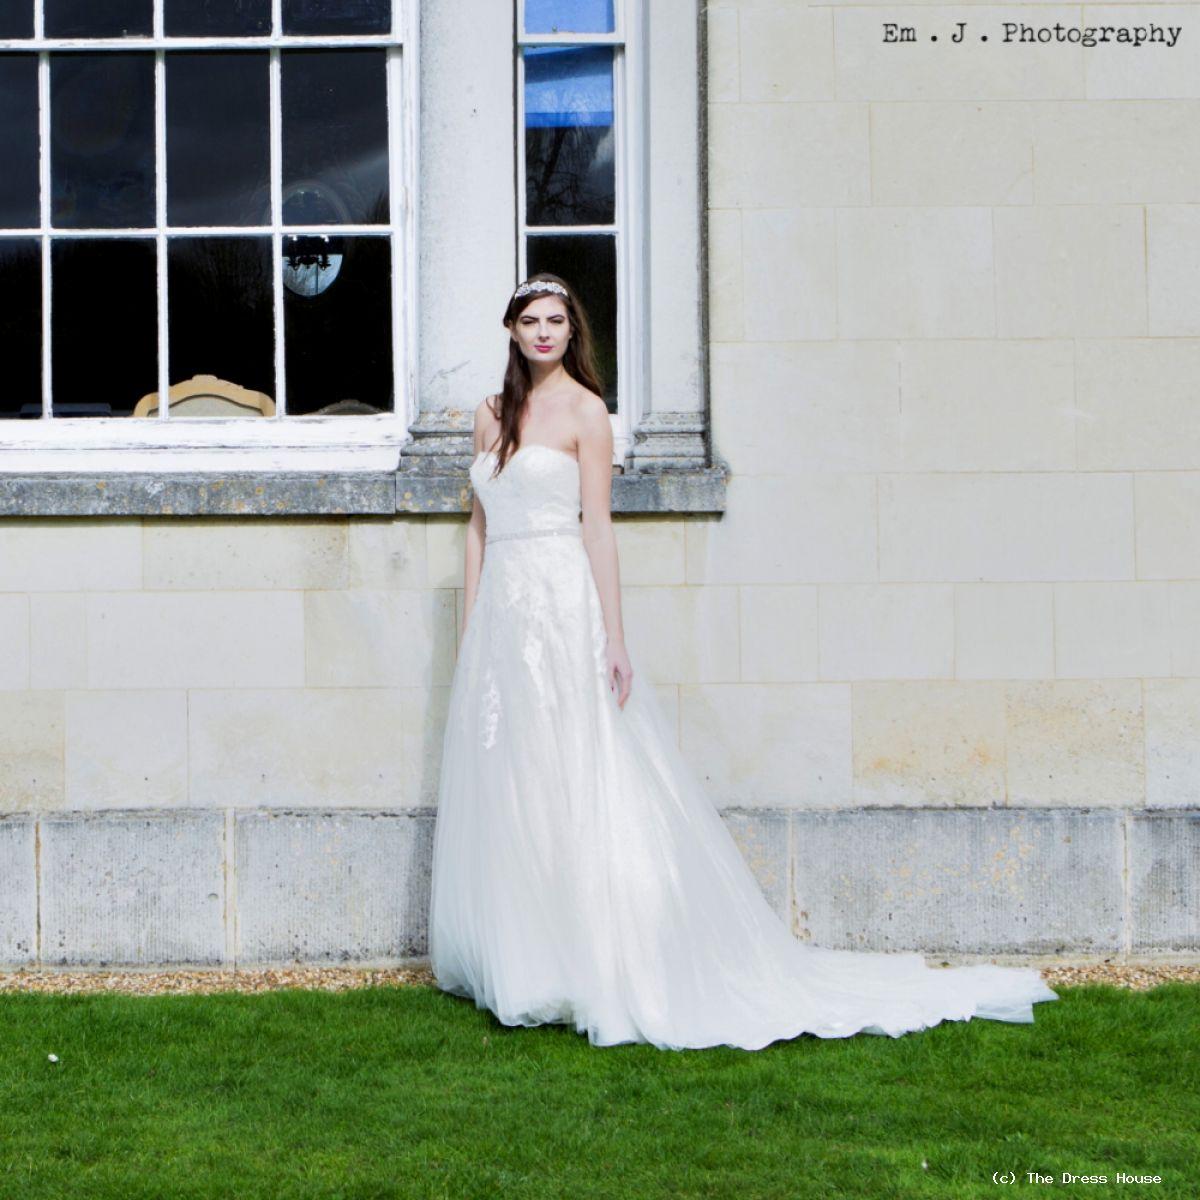 The A Line Wedding Dress Silhouette